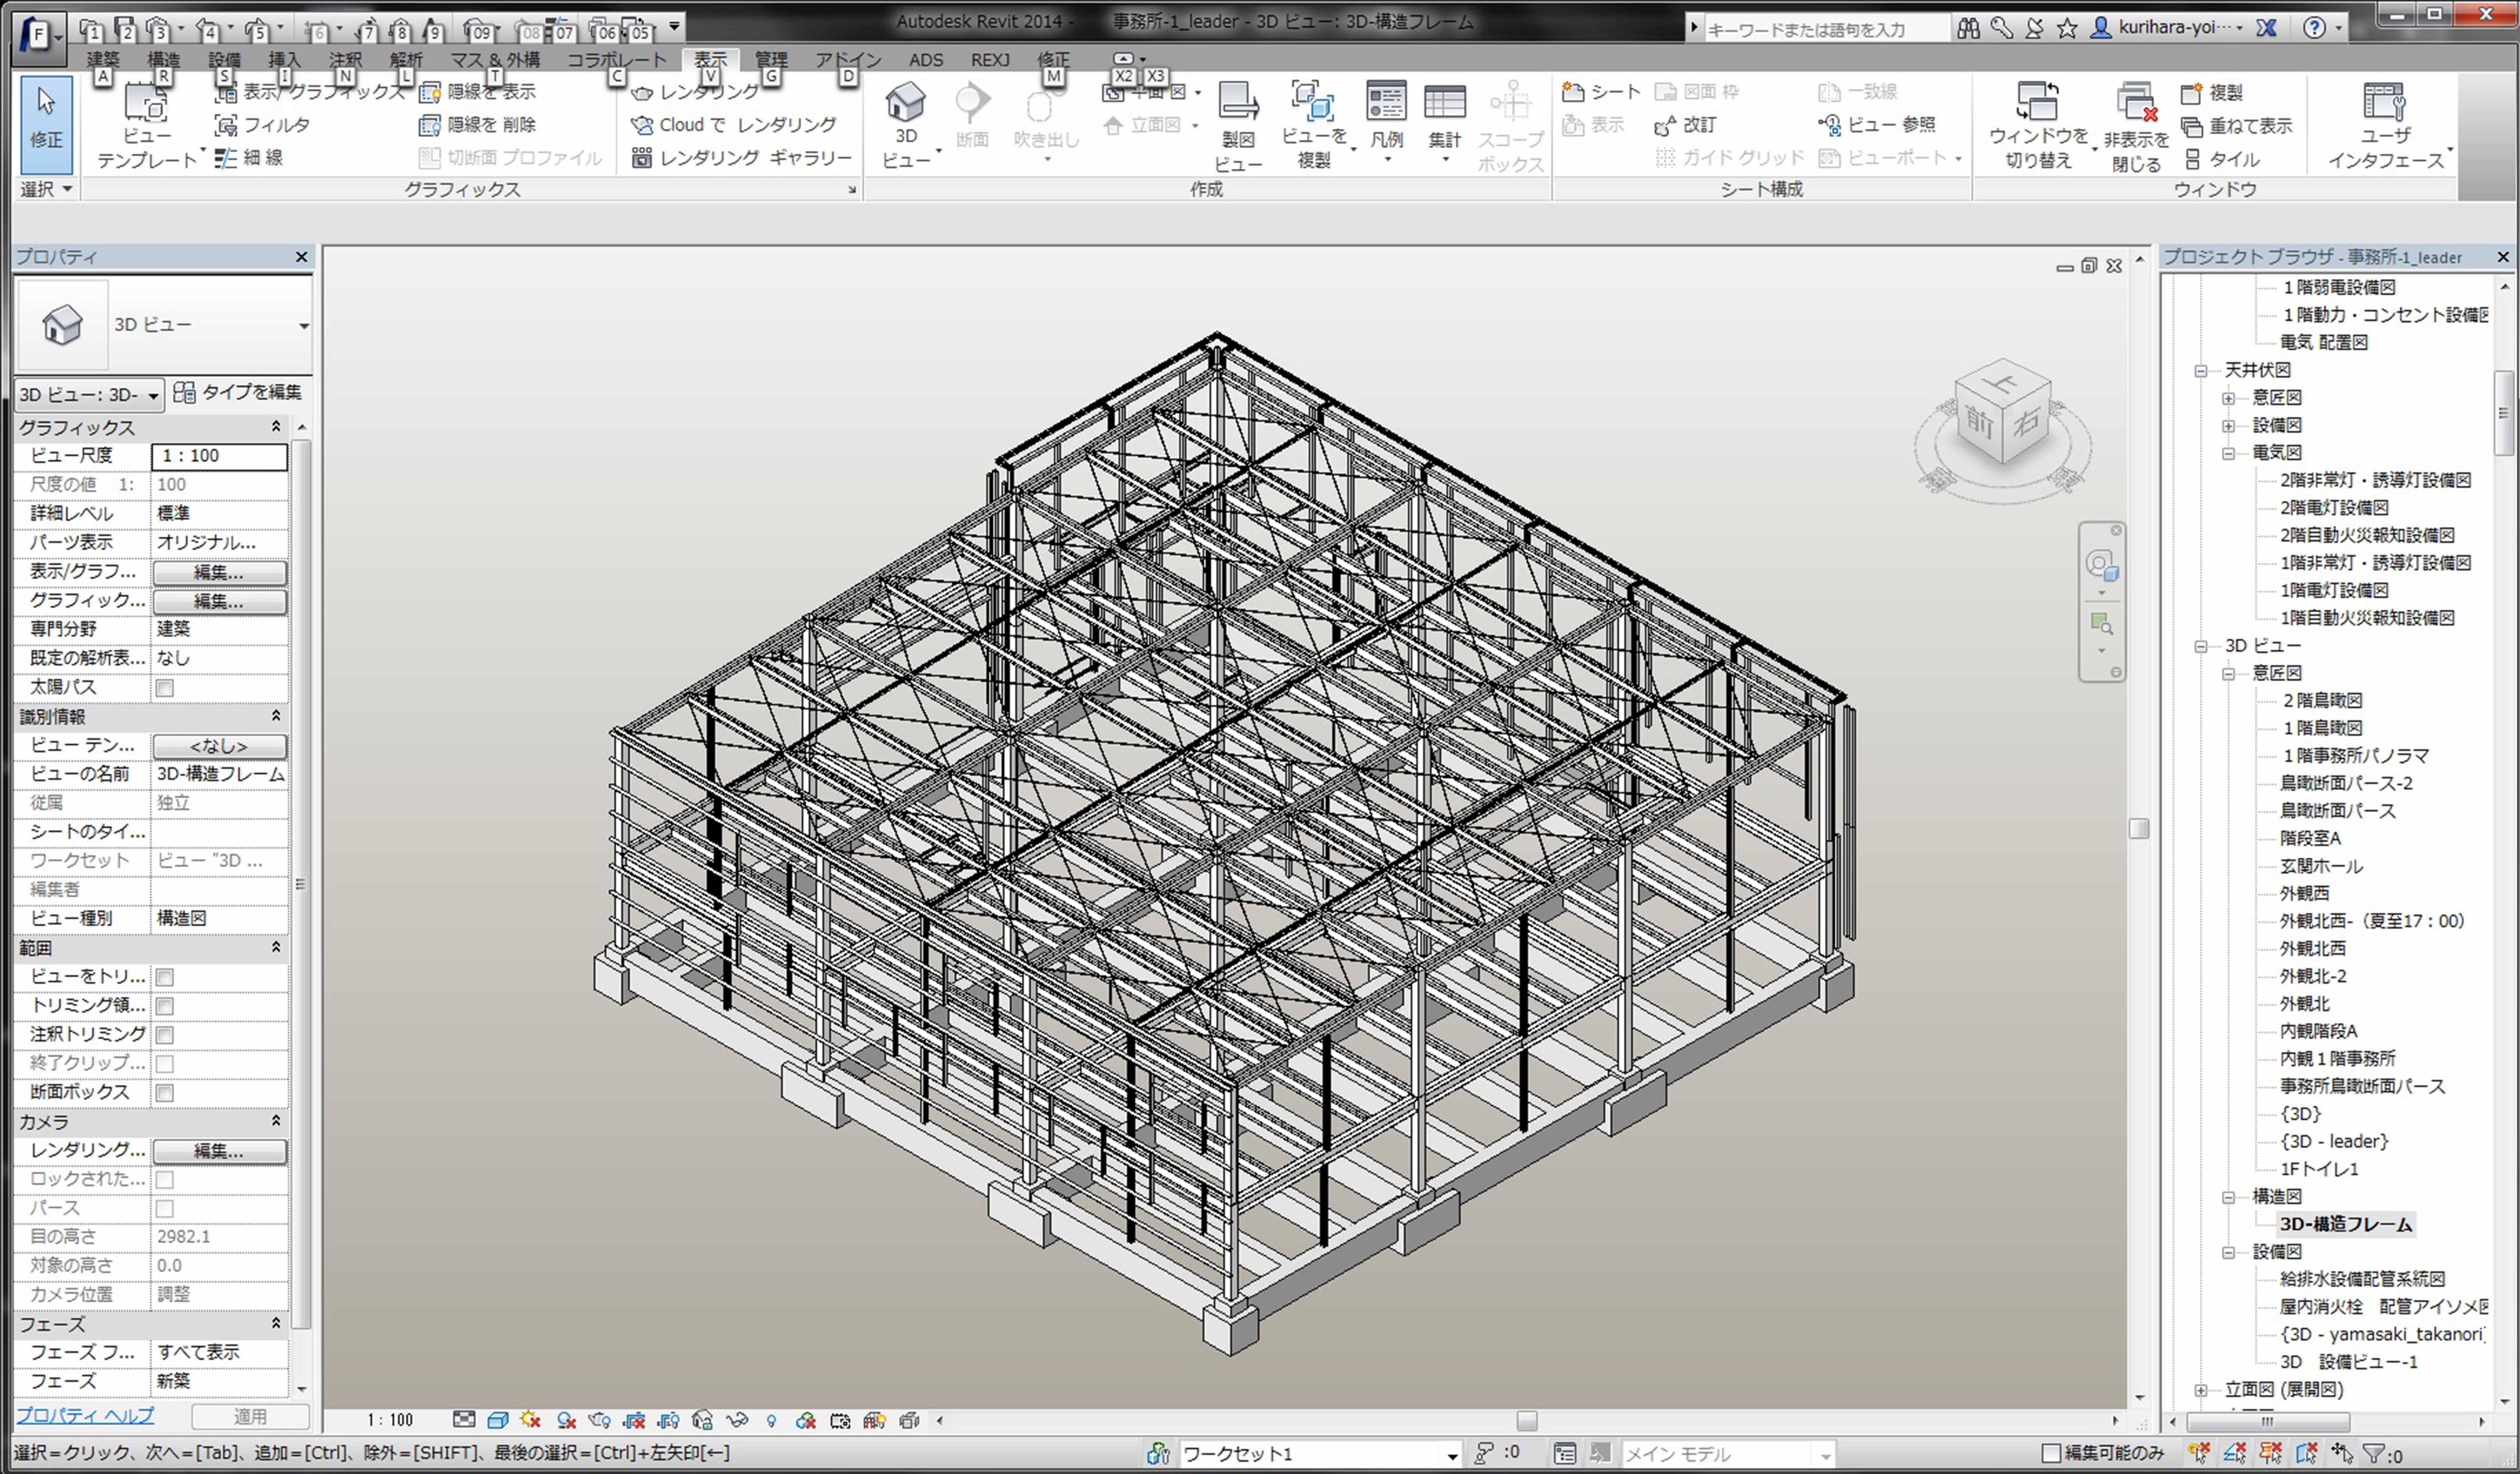 構造3Dビュー